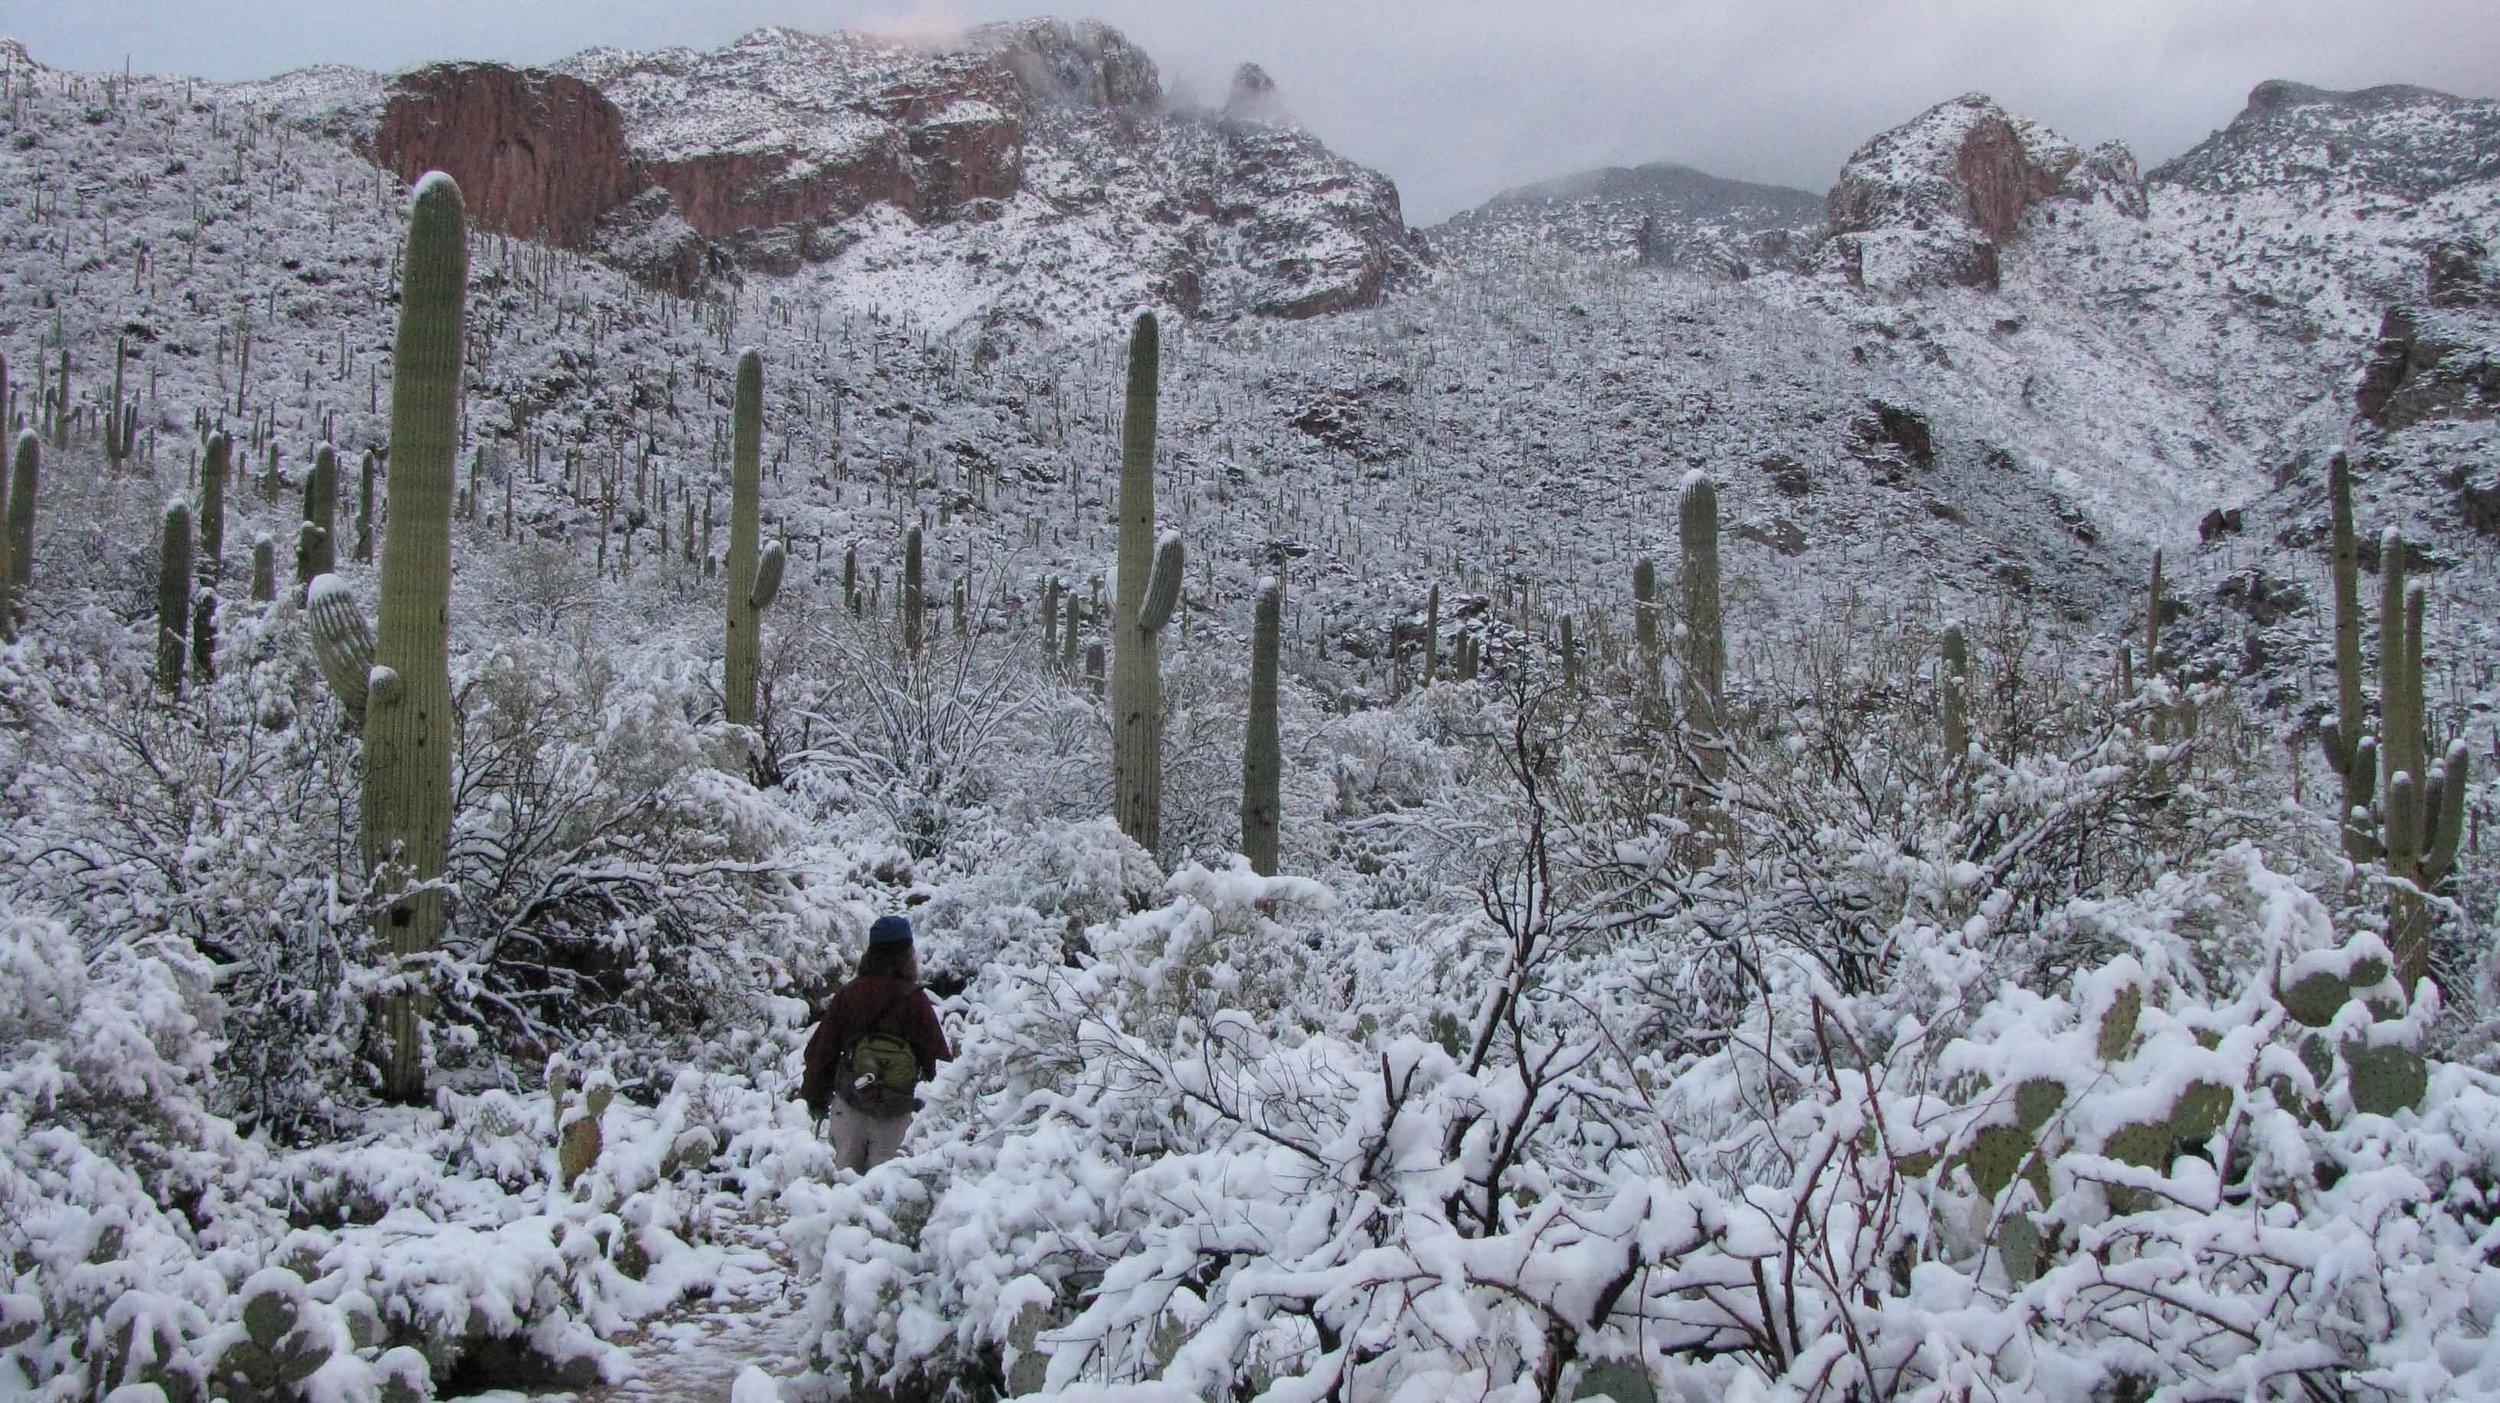 Snow in Pontatoc Canyon - Feb 2013.jpg